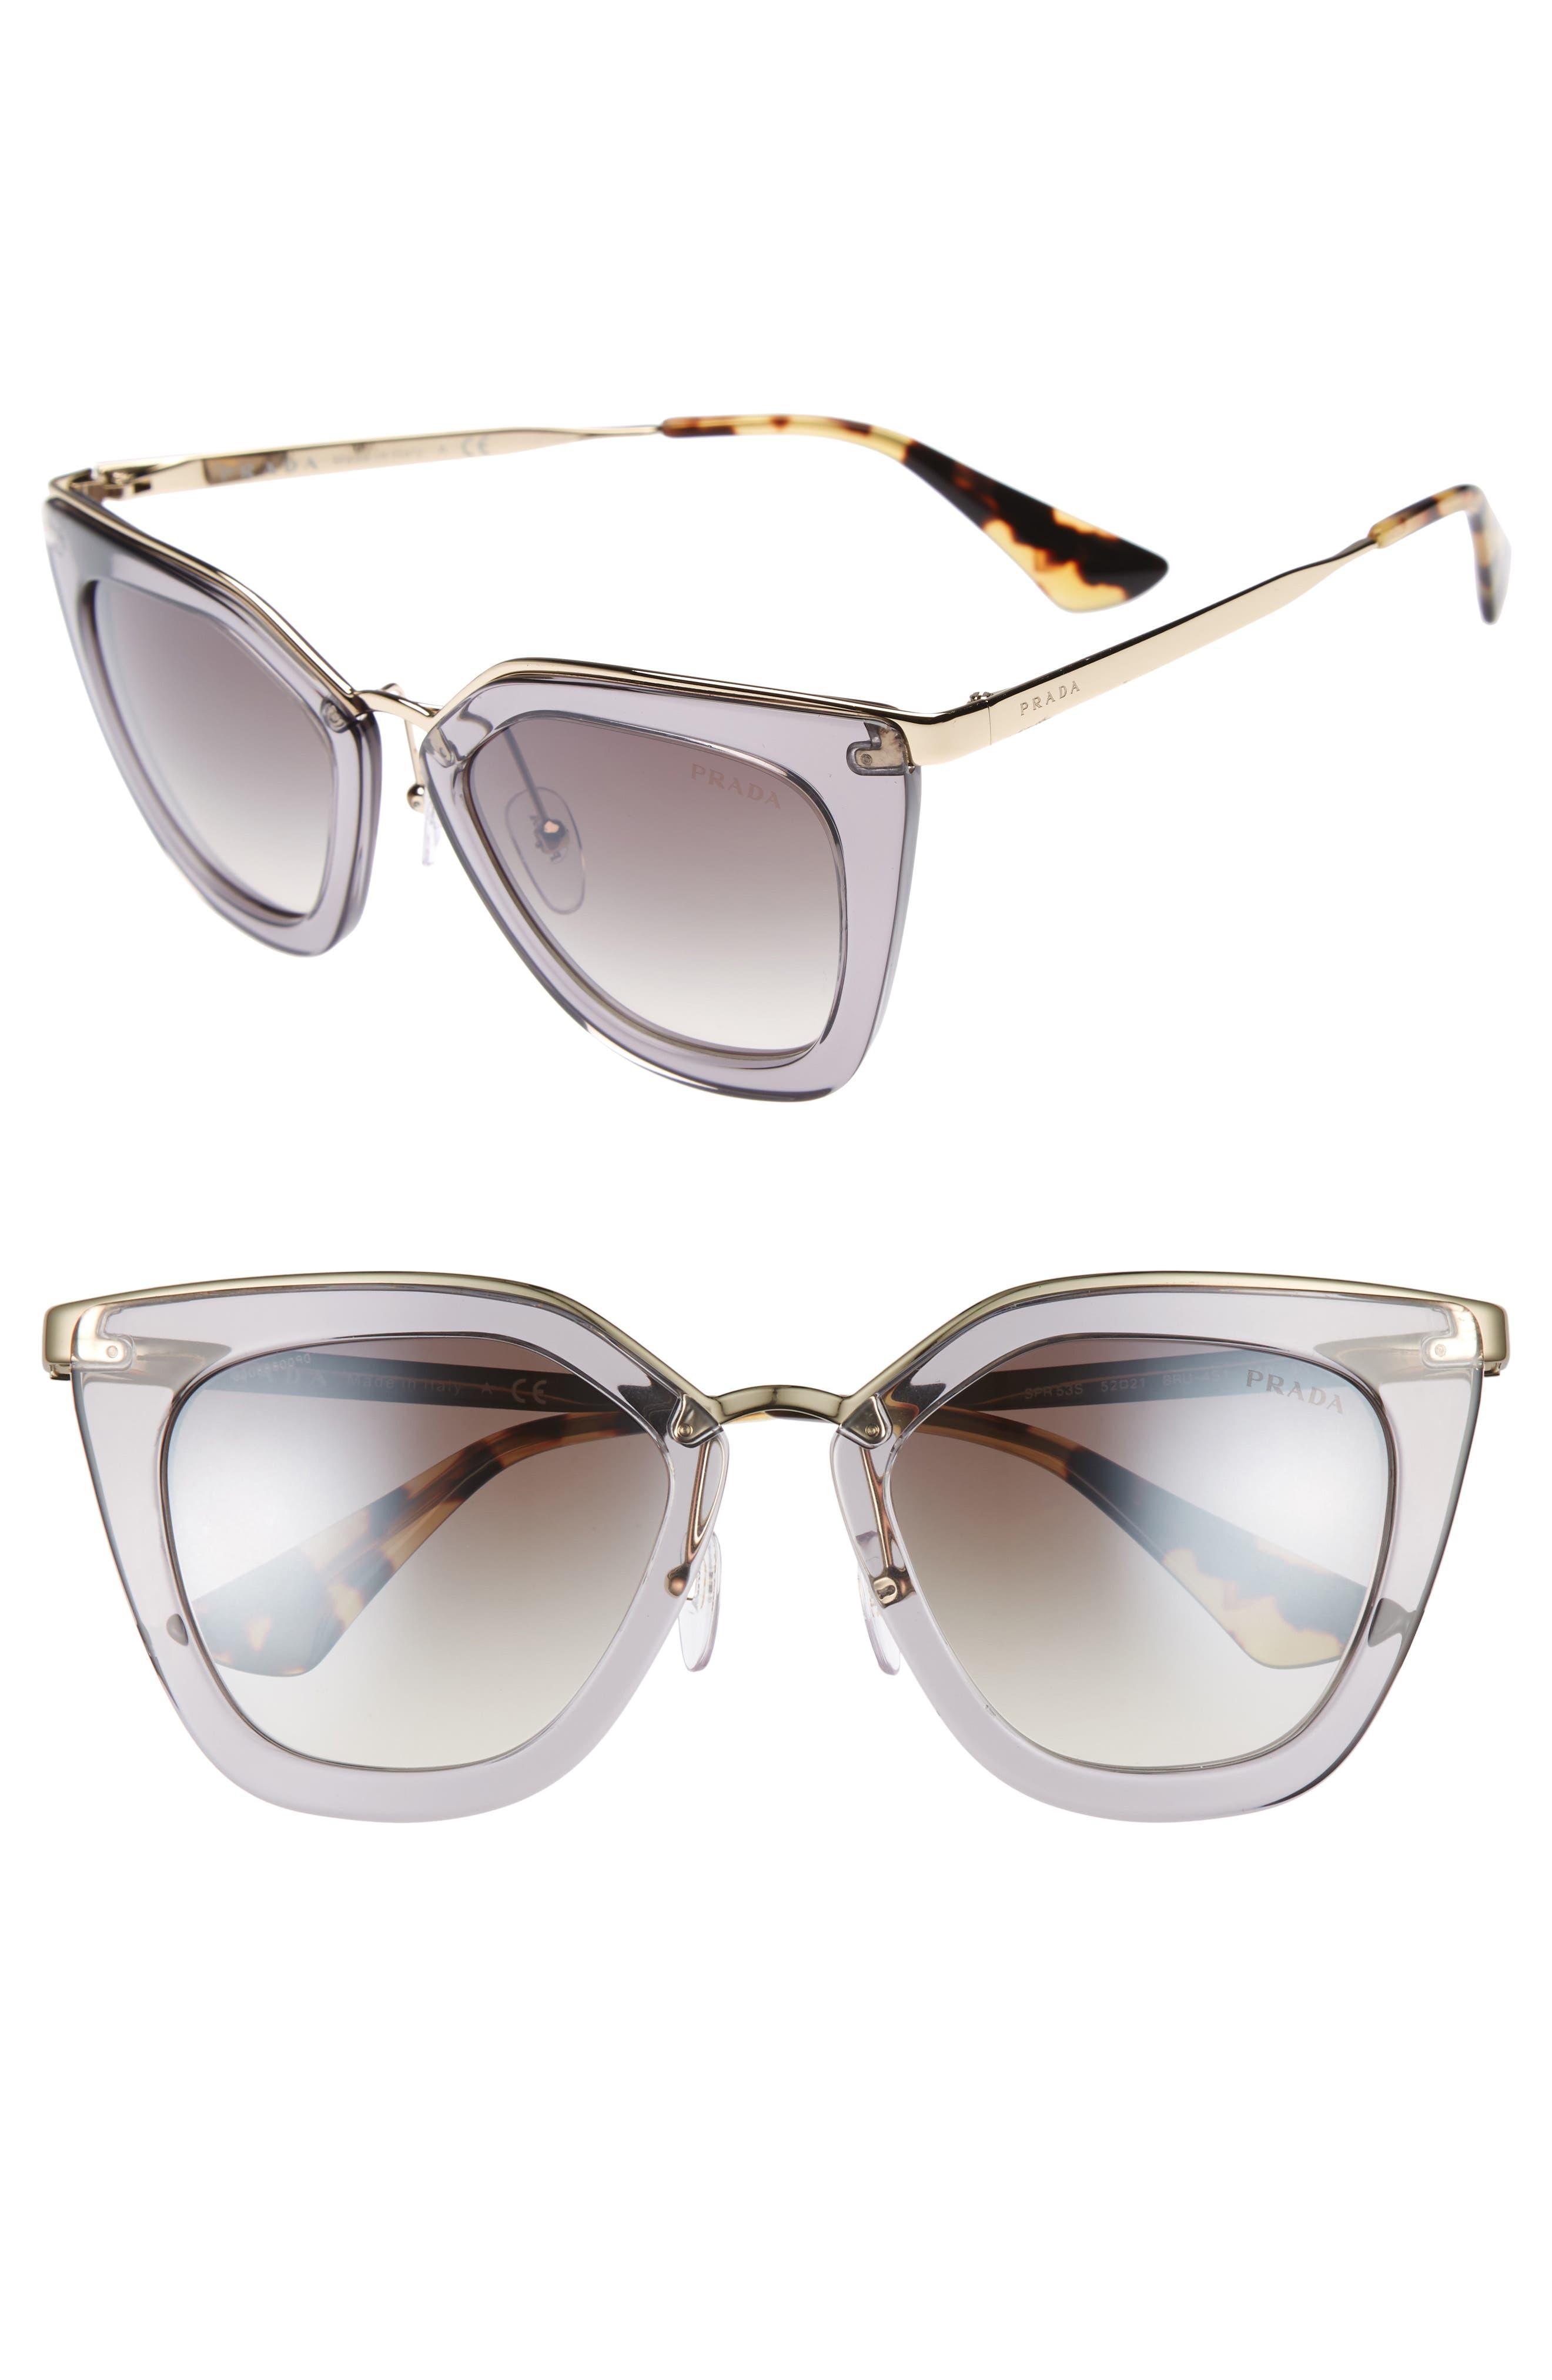 52mm Gradient Cat Eye Sunglasses,                             Main thumbnail 1, color,                             020